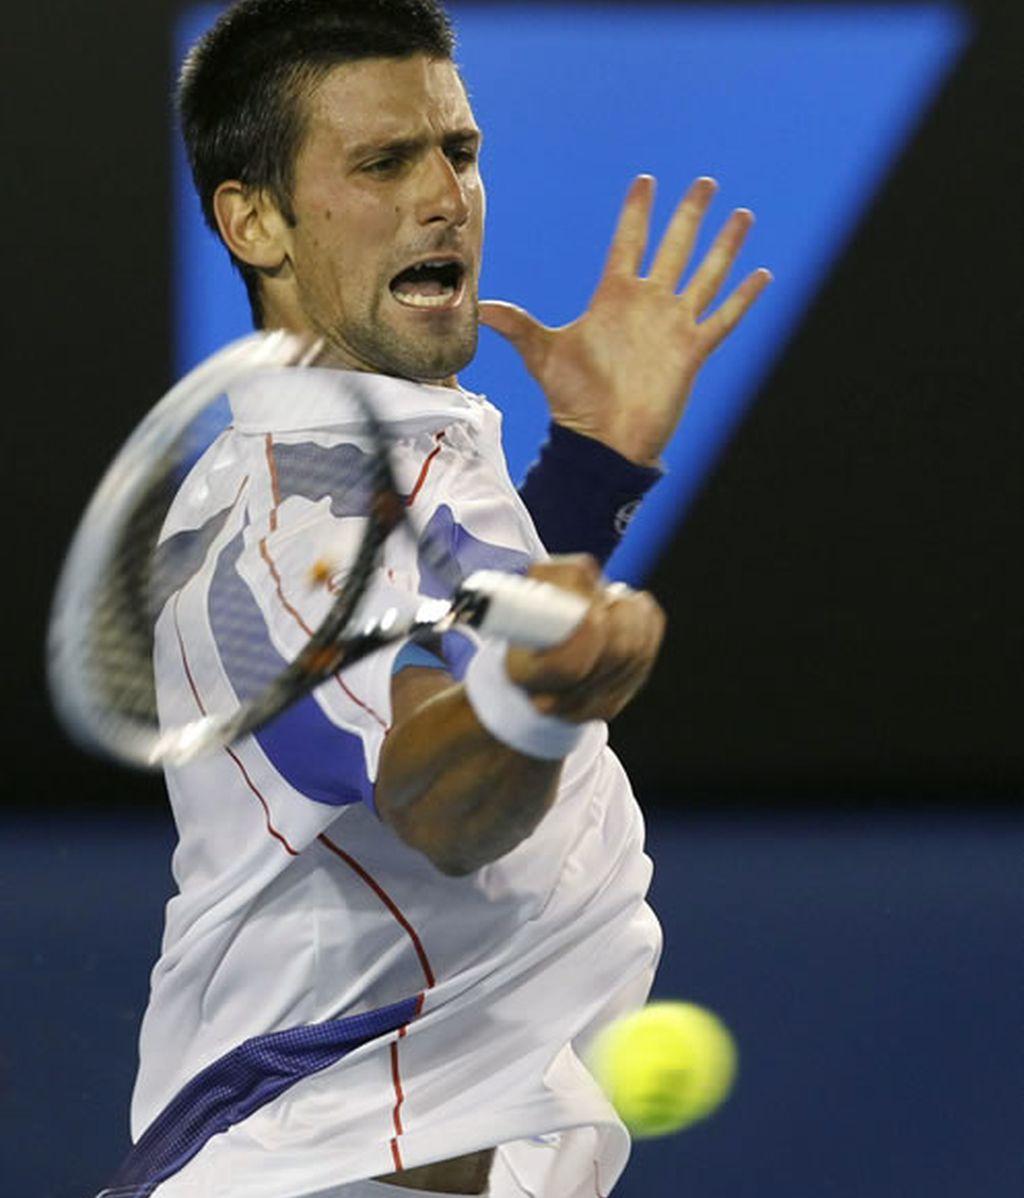 Novak Djokovic se lleva el primer ser frente a Andy Murray